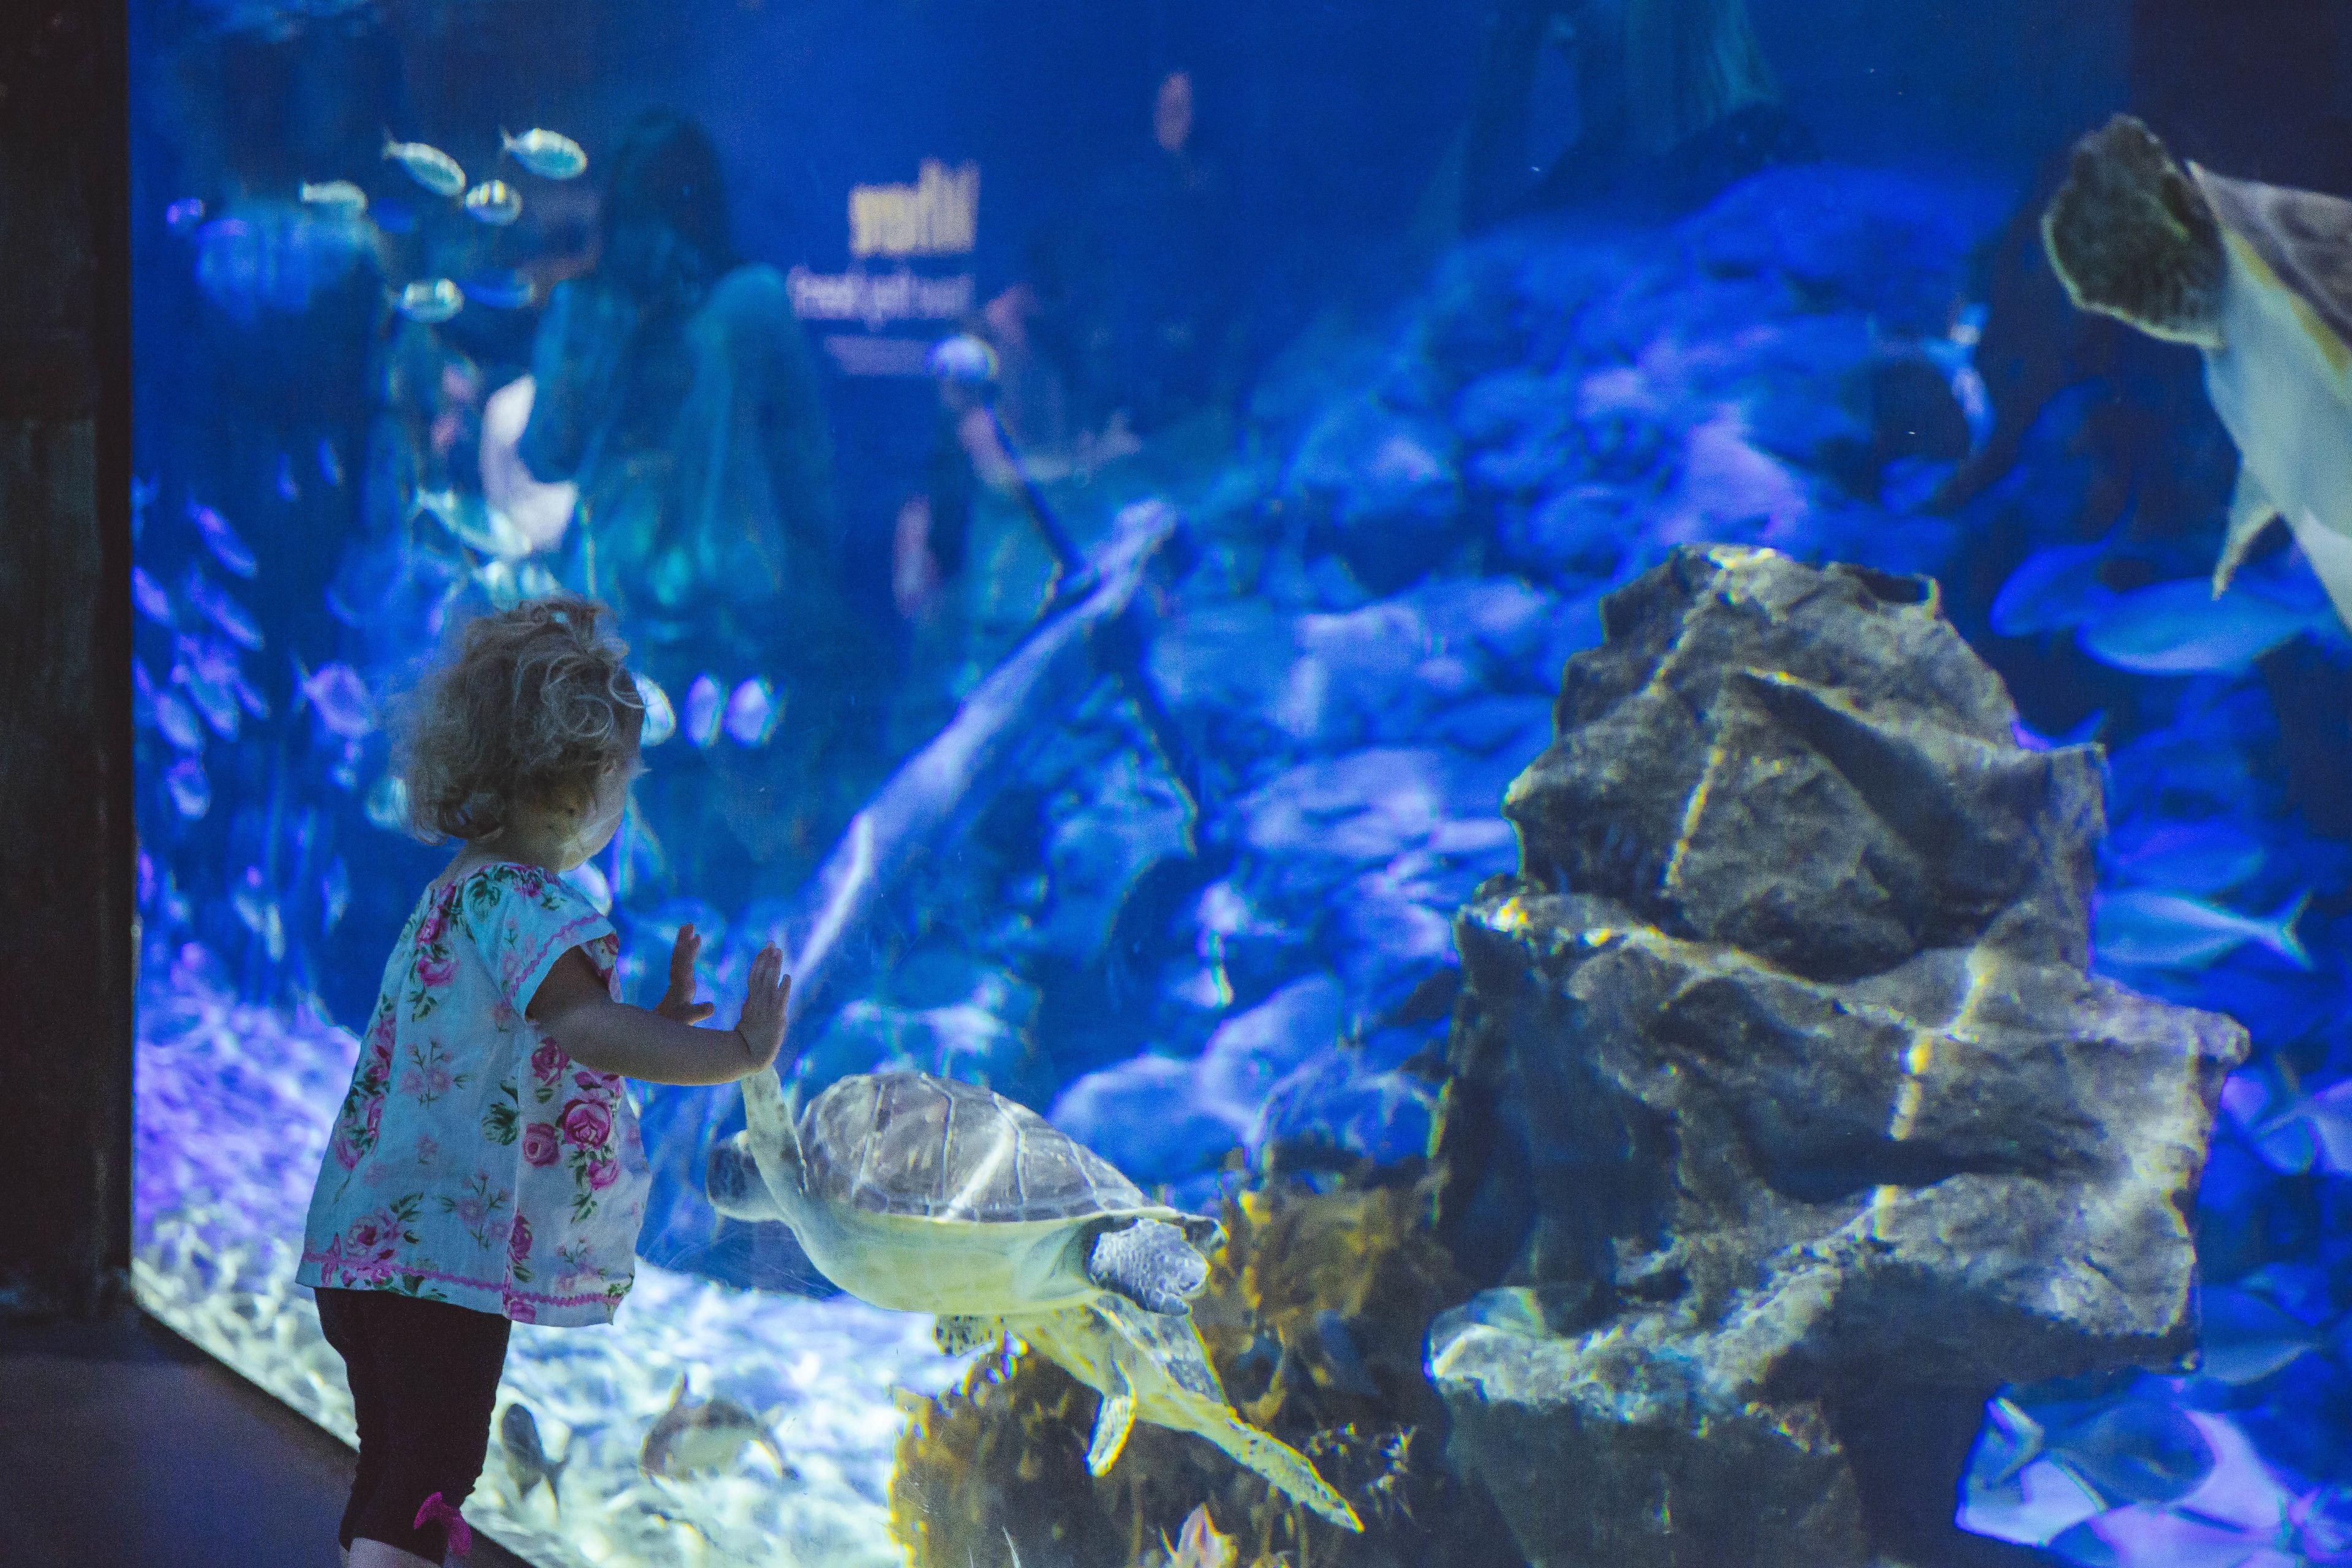 Admission to SEA LIFE Kelly Tarlton's Aquarium